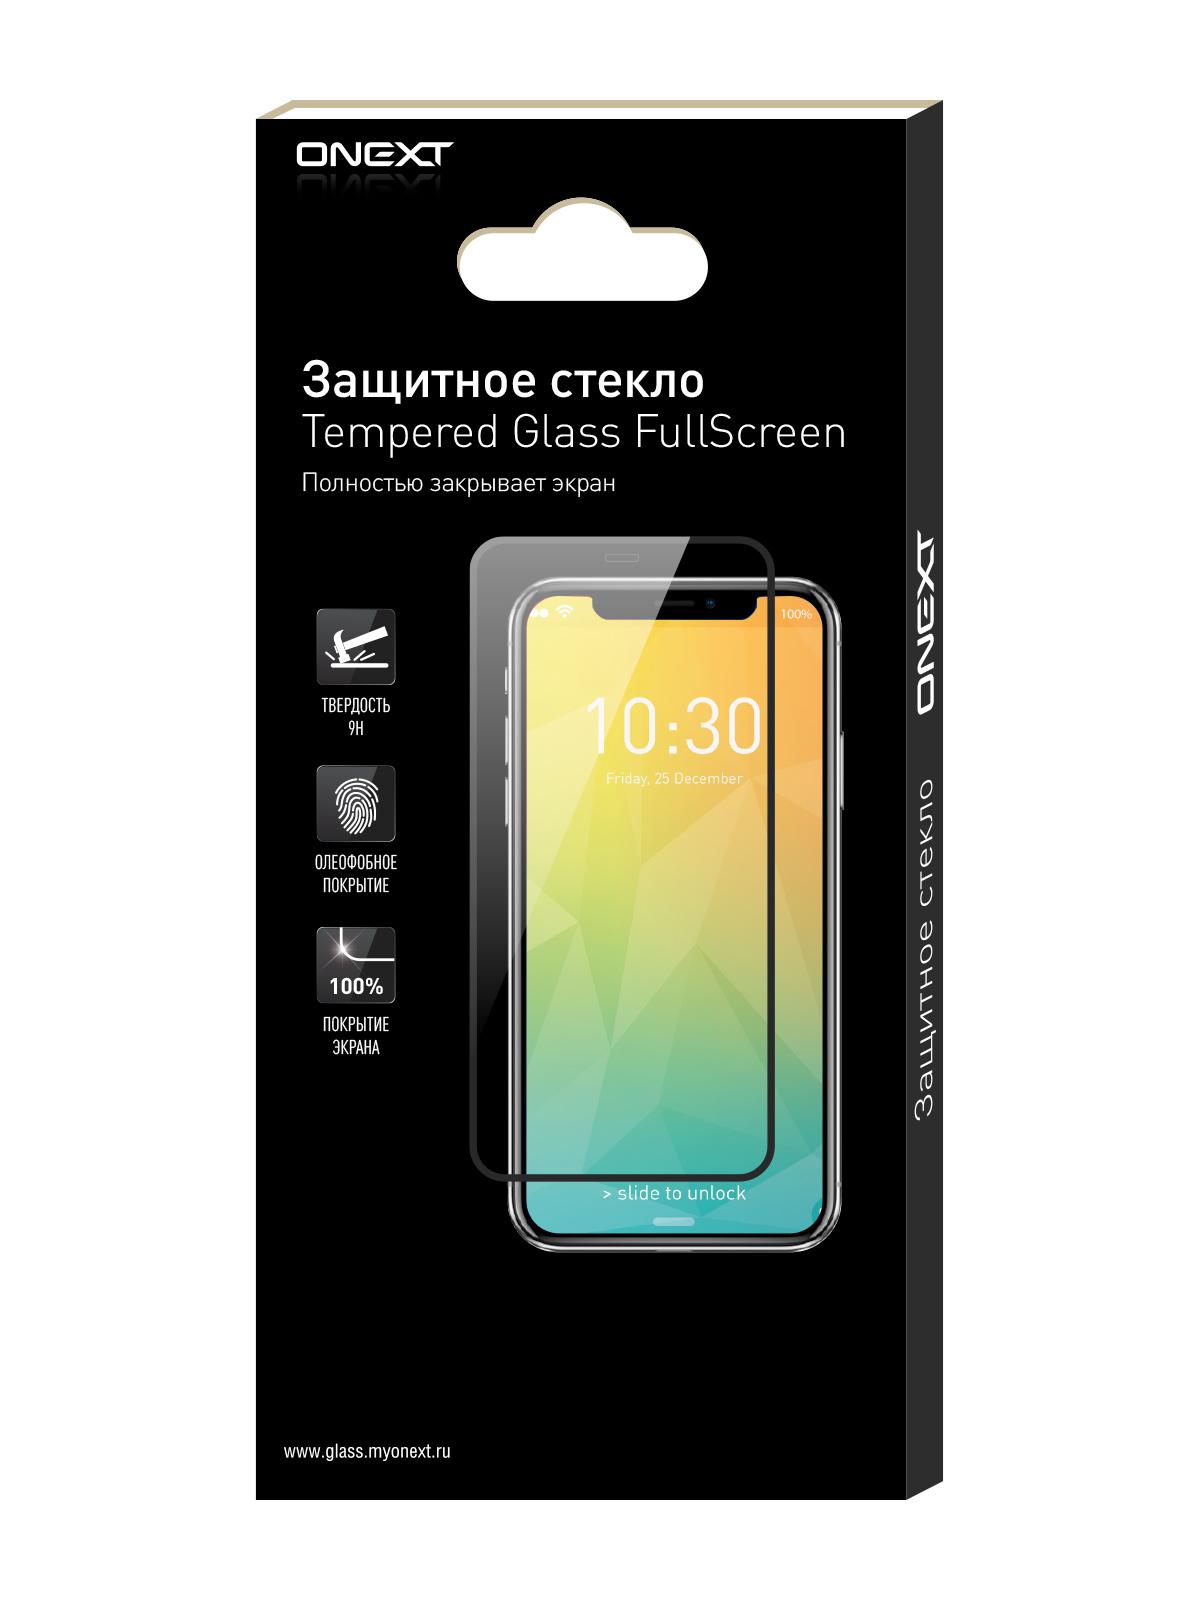 Защитное стекло ONEXT для Huawei Honor 9 Lite Black